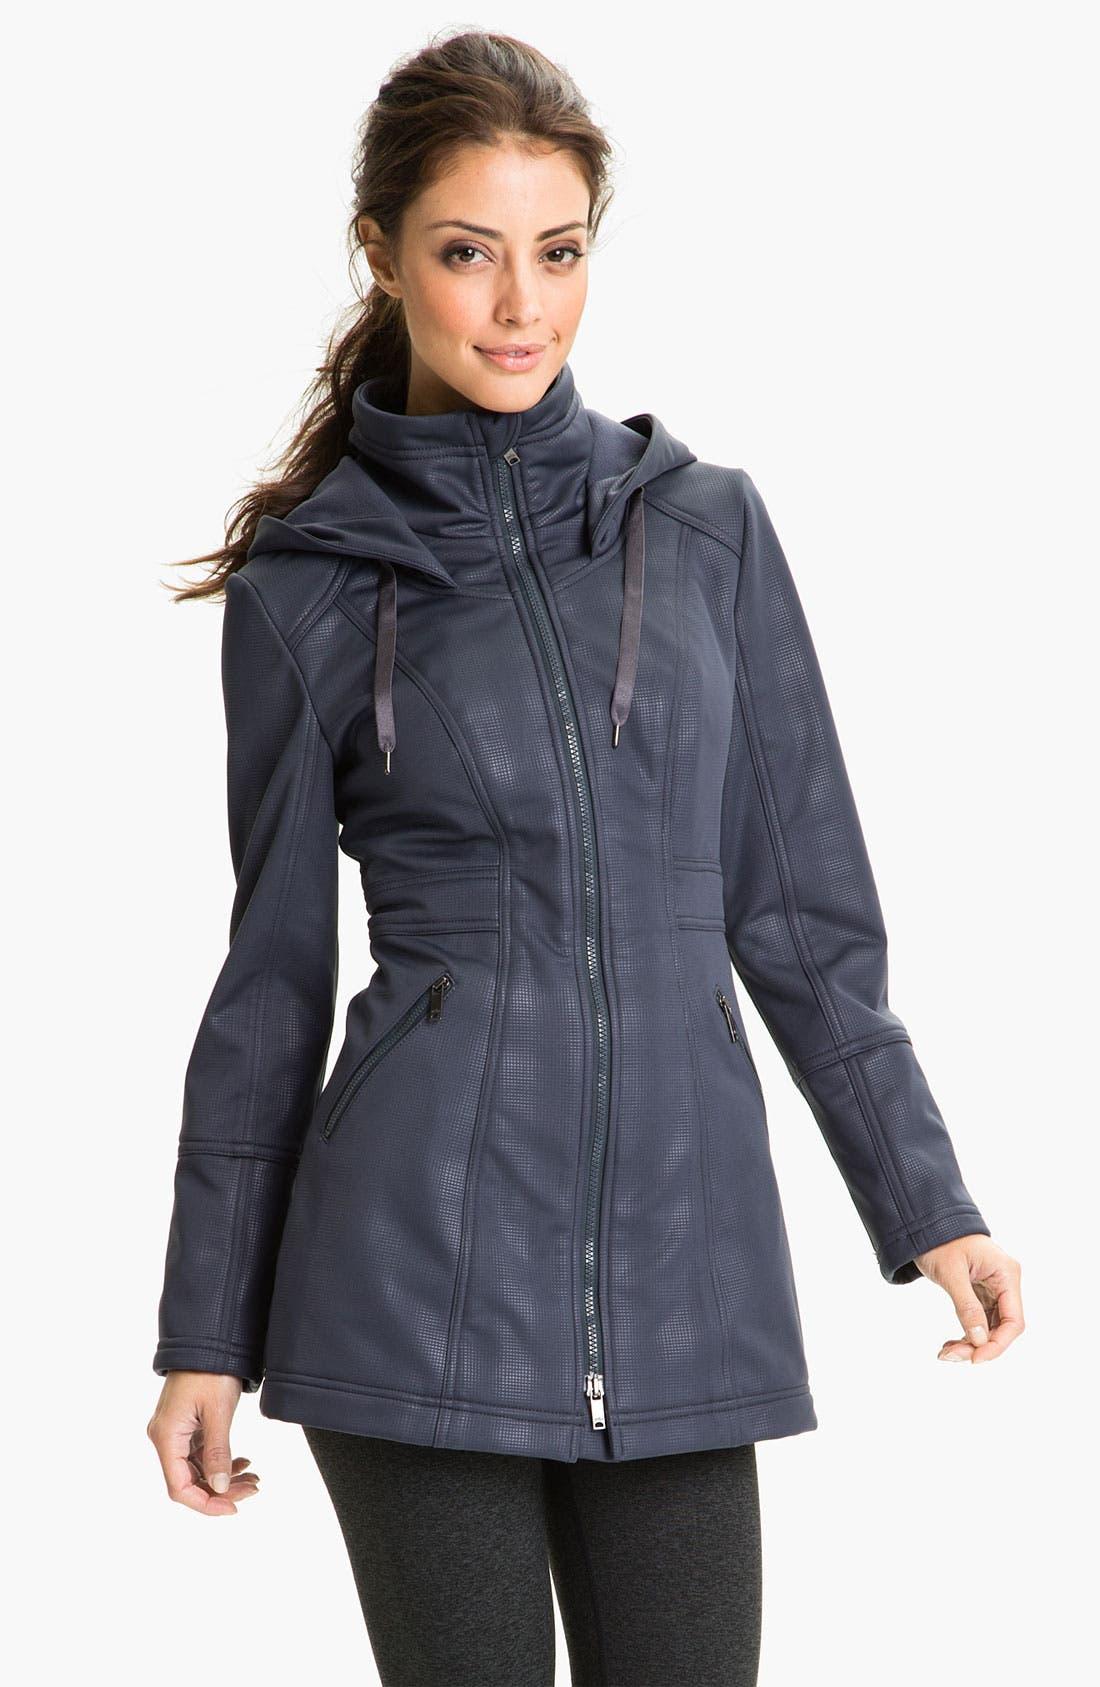 Main Image - Zella 'No Chill' Hooded Jacket